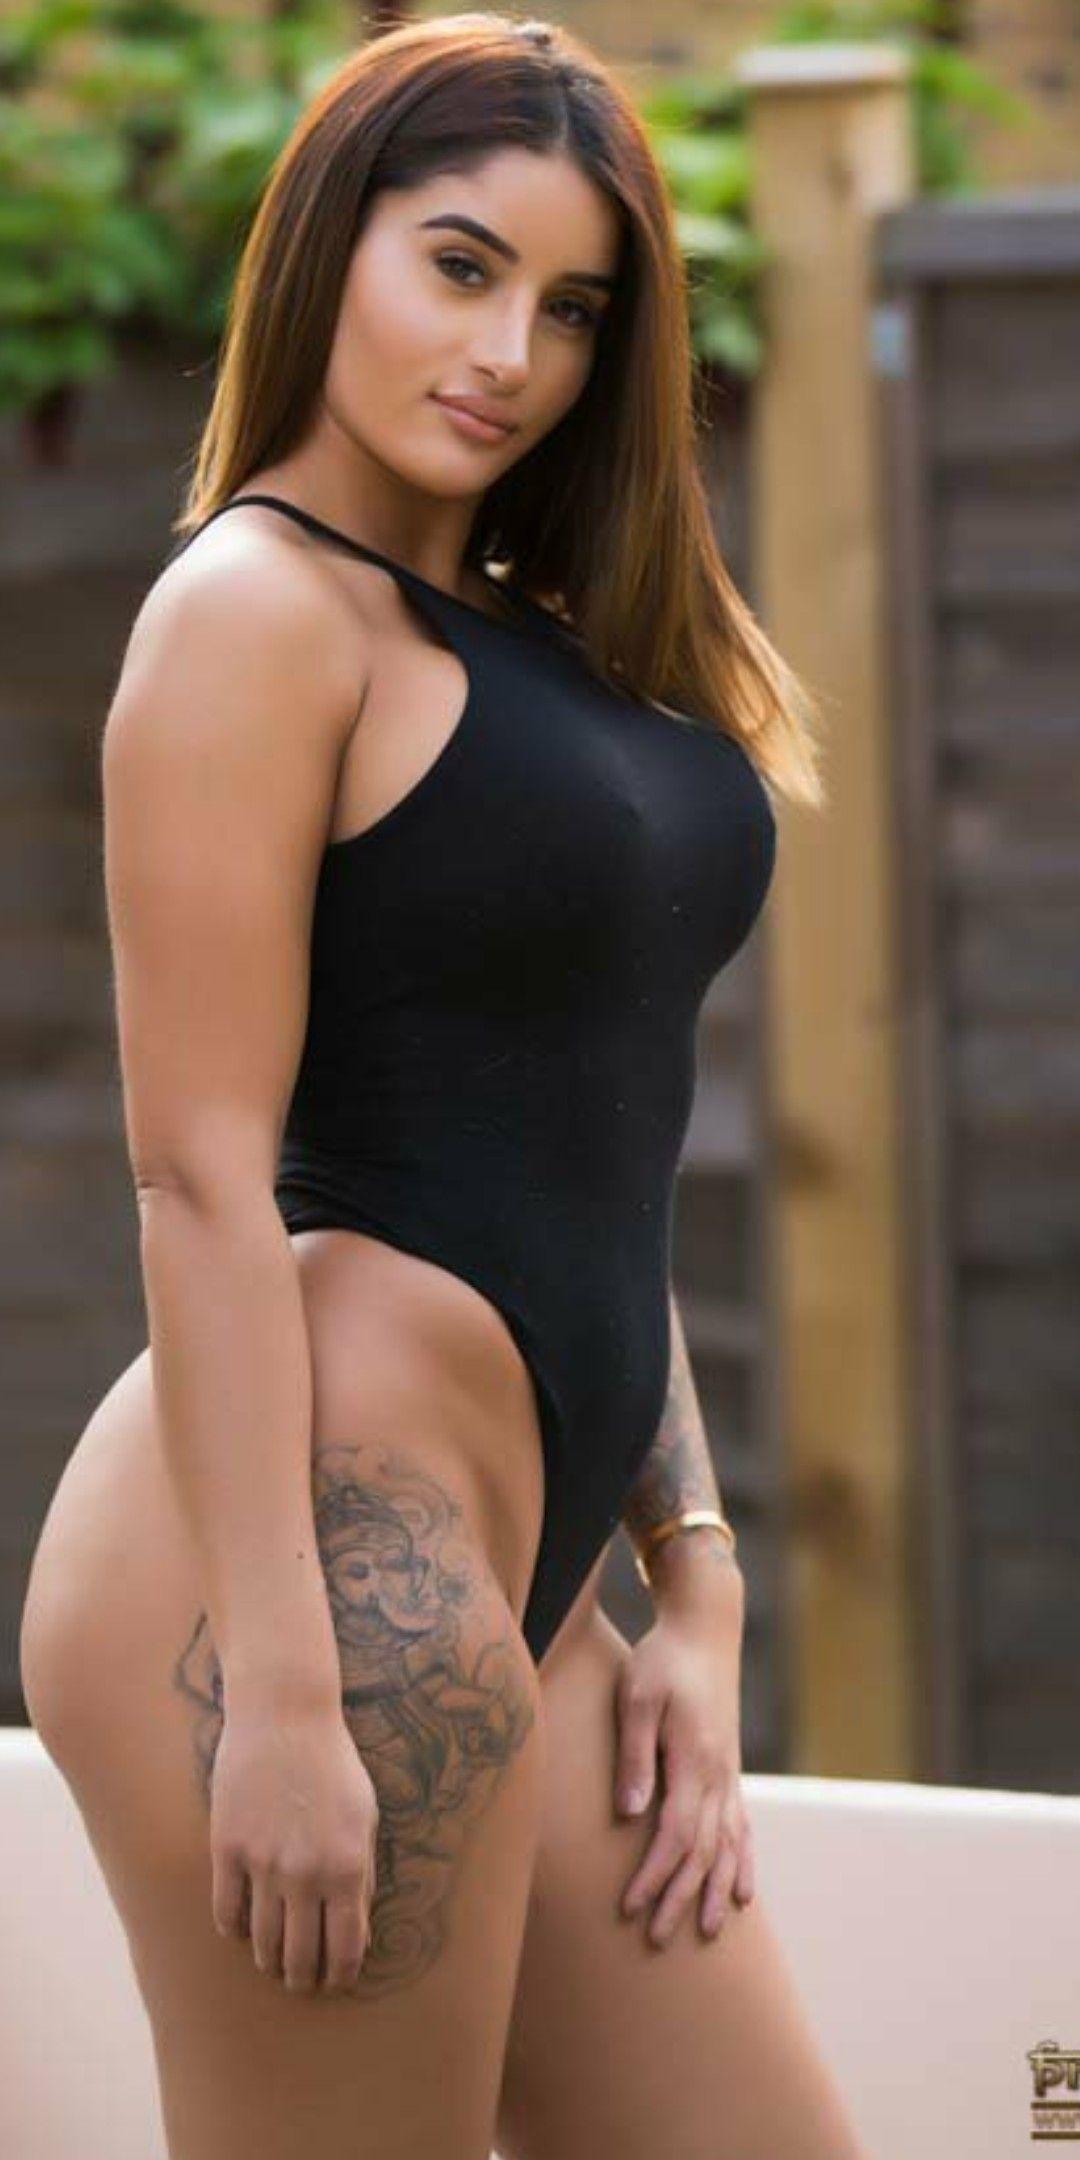 Sandra carolina,Amber Rose nudes. 2018-2019 celebrityes photos leaks! Sex image Leigh Lombardi Moontrap -,Official calendar 2019